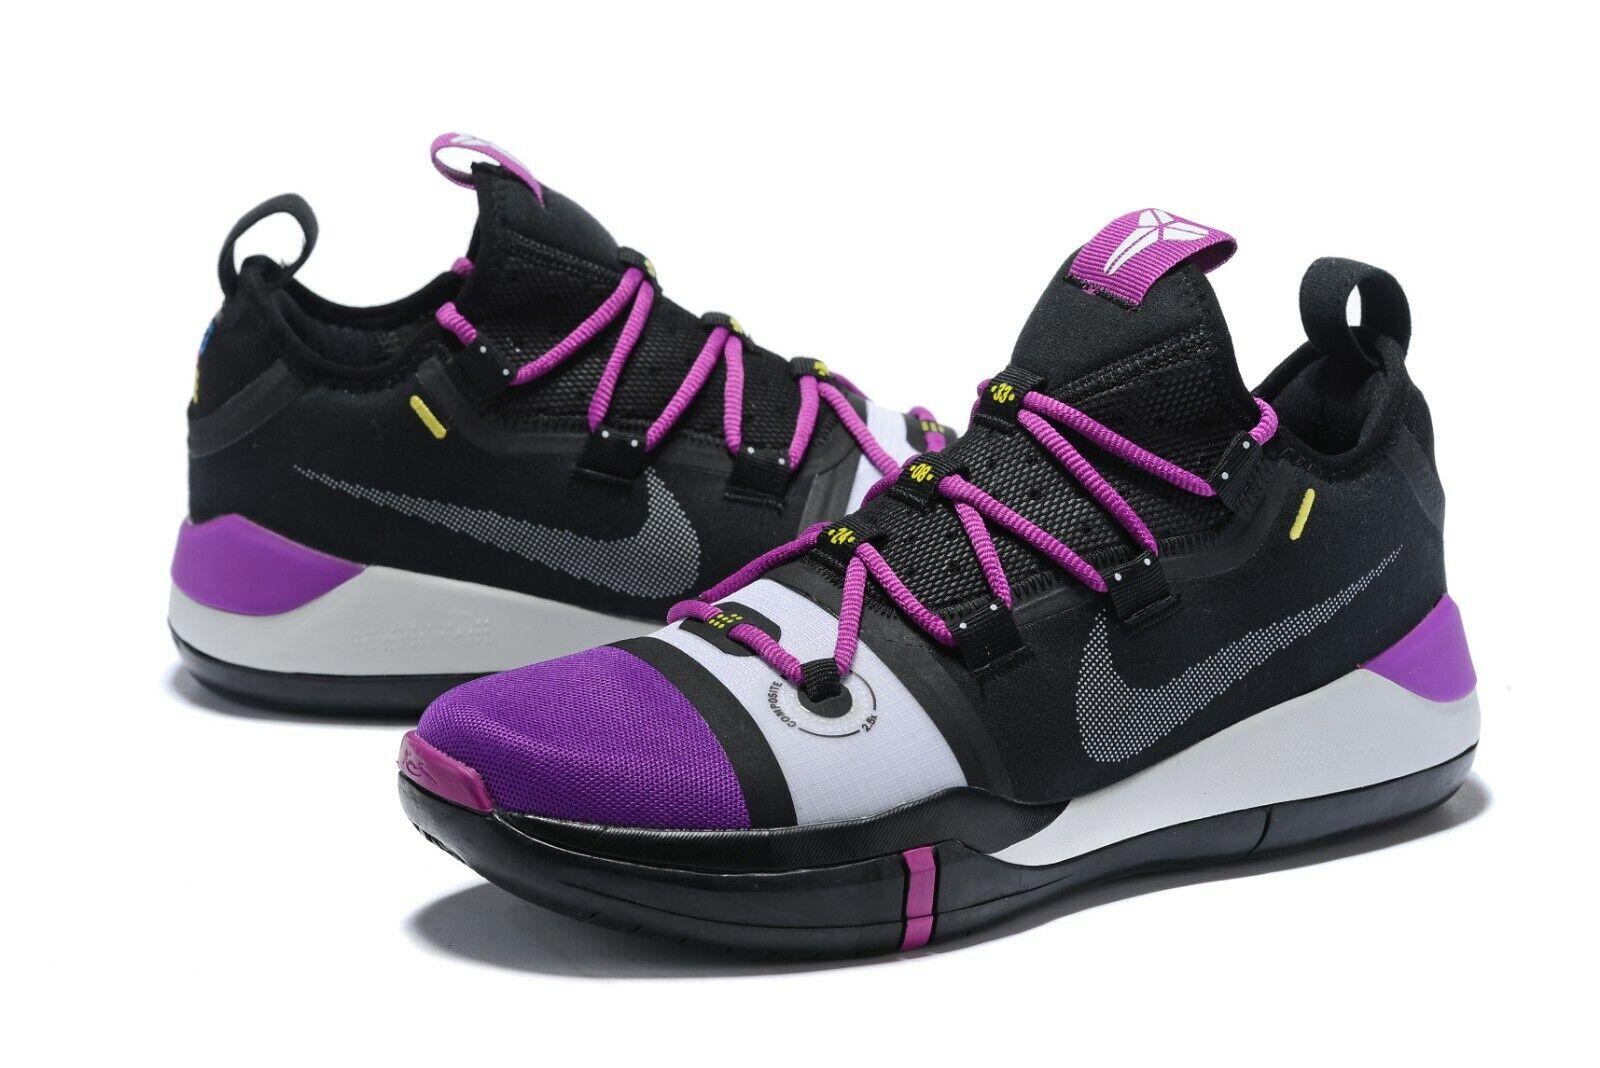 3a3a8d7ffa2 Nike Kobe AD Exodus Basketball Shoes